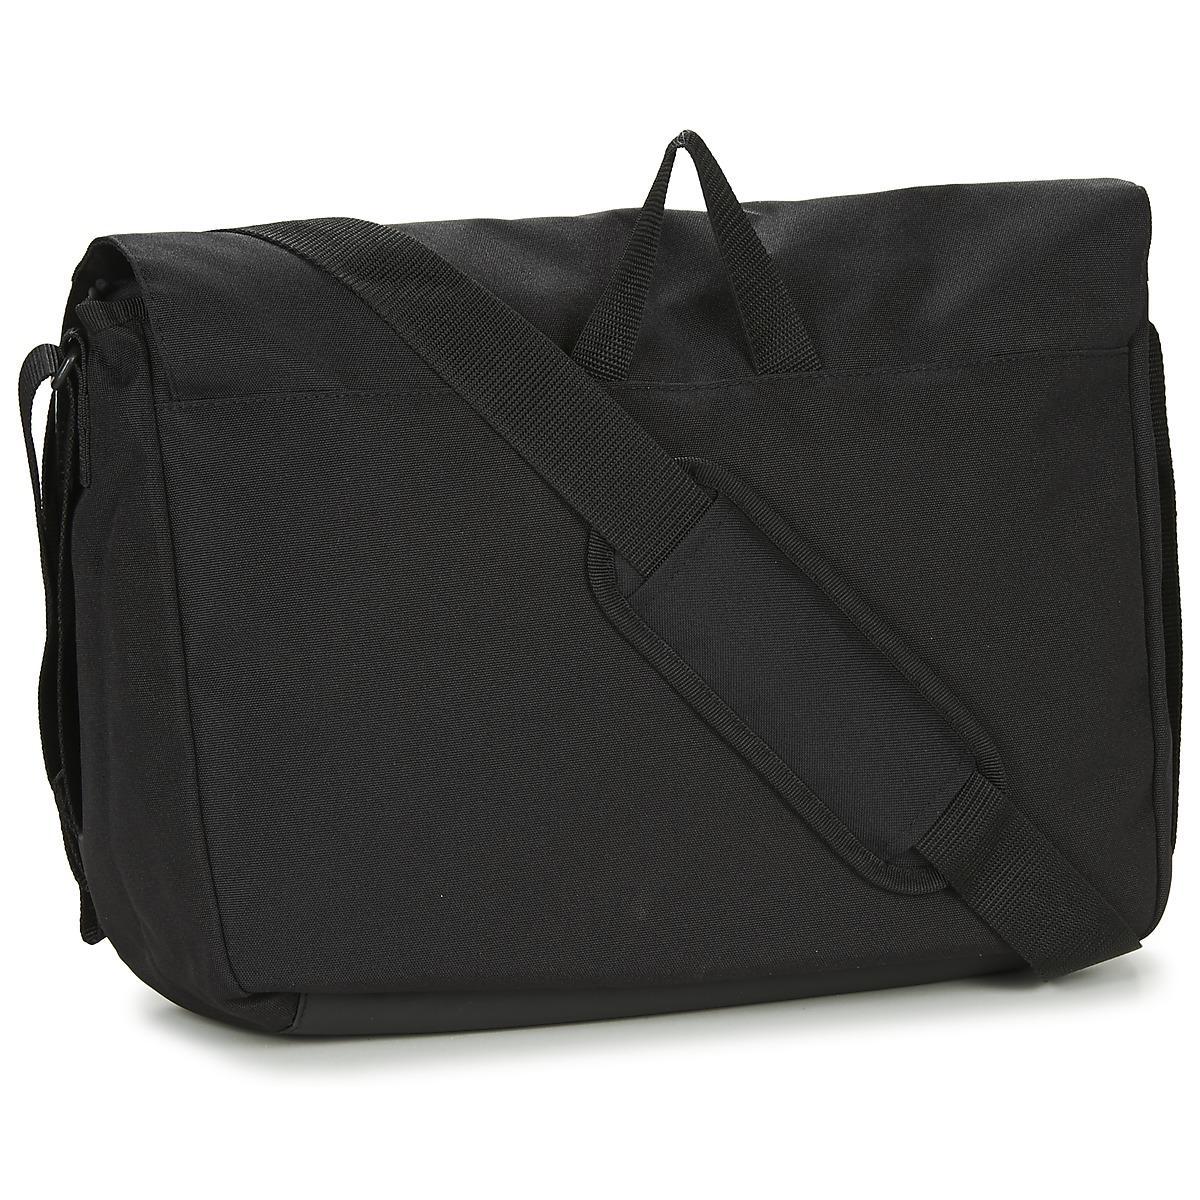 adidas Linear Messenger Messenger Bag in Black for Men - Lyst 5a35690d3a